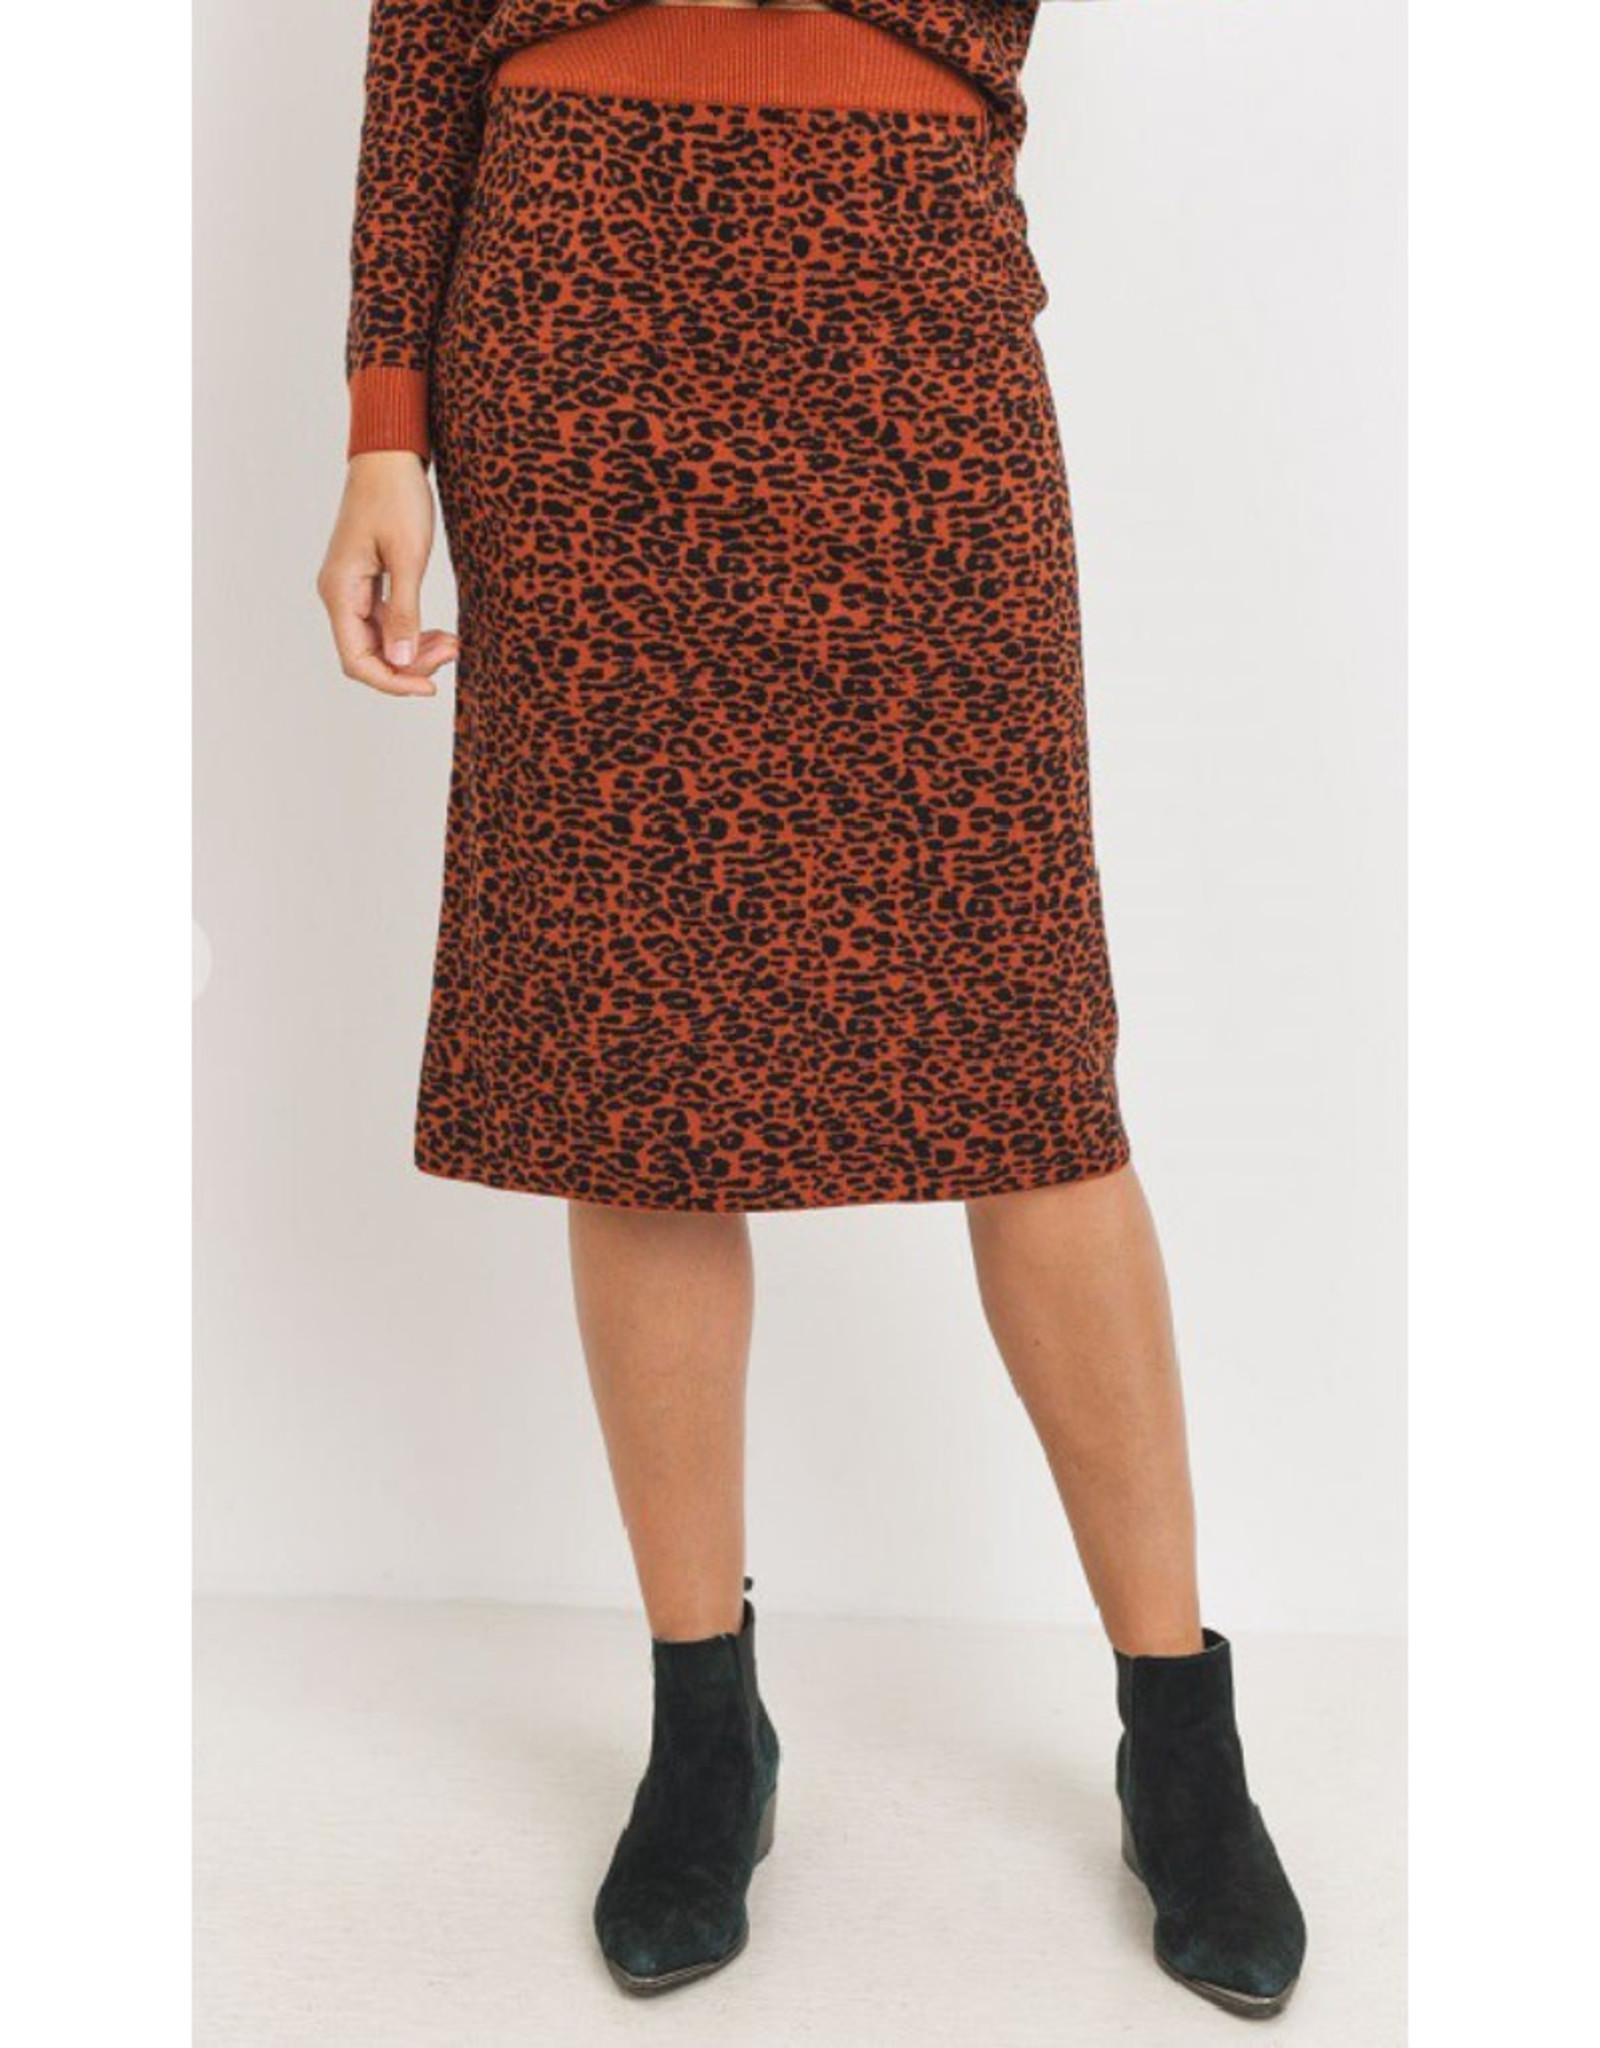 Leopard Print Sweater Skirt